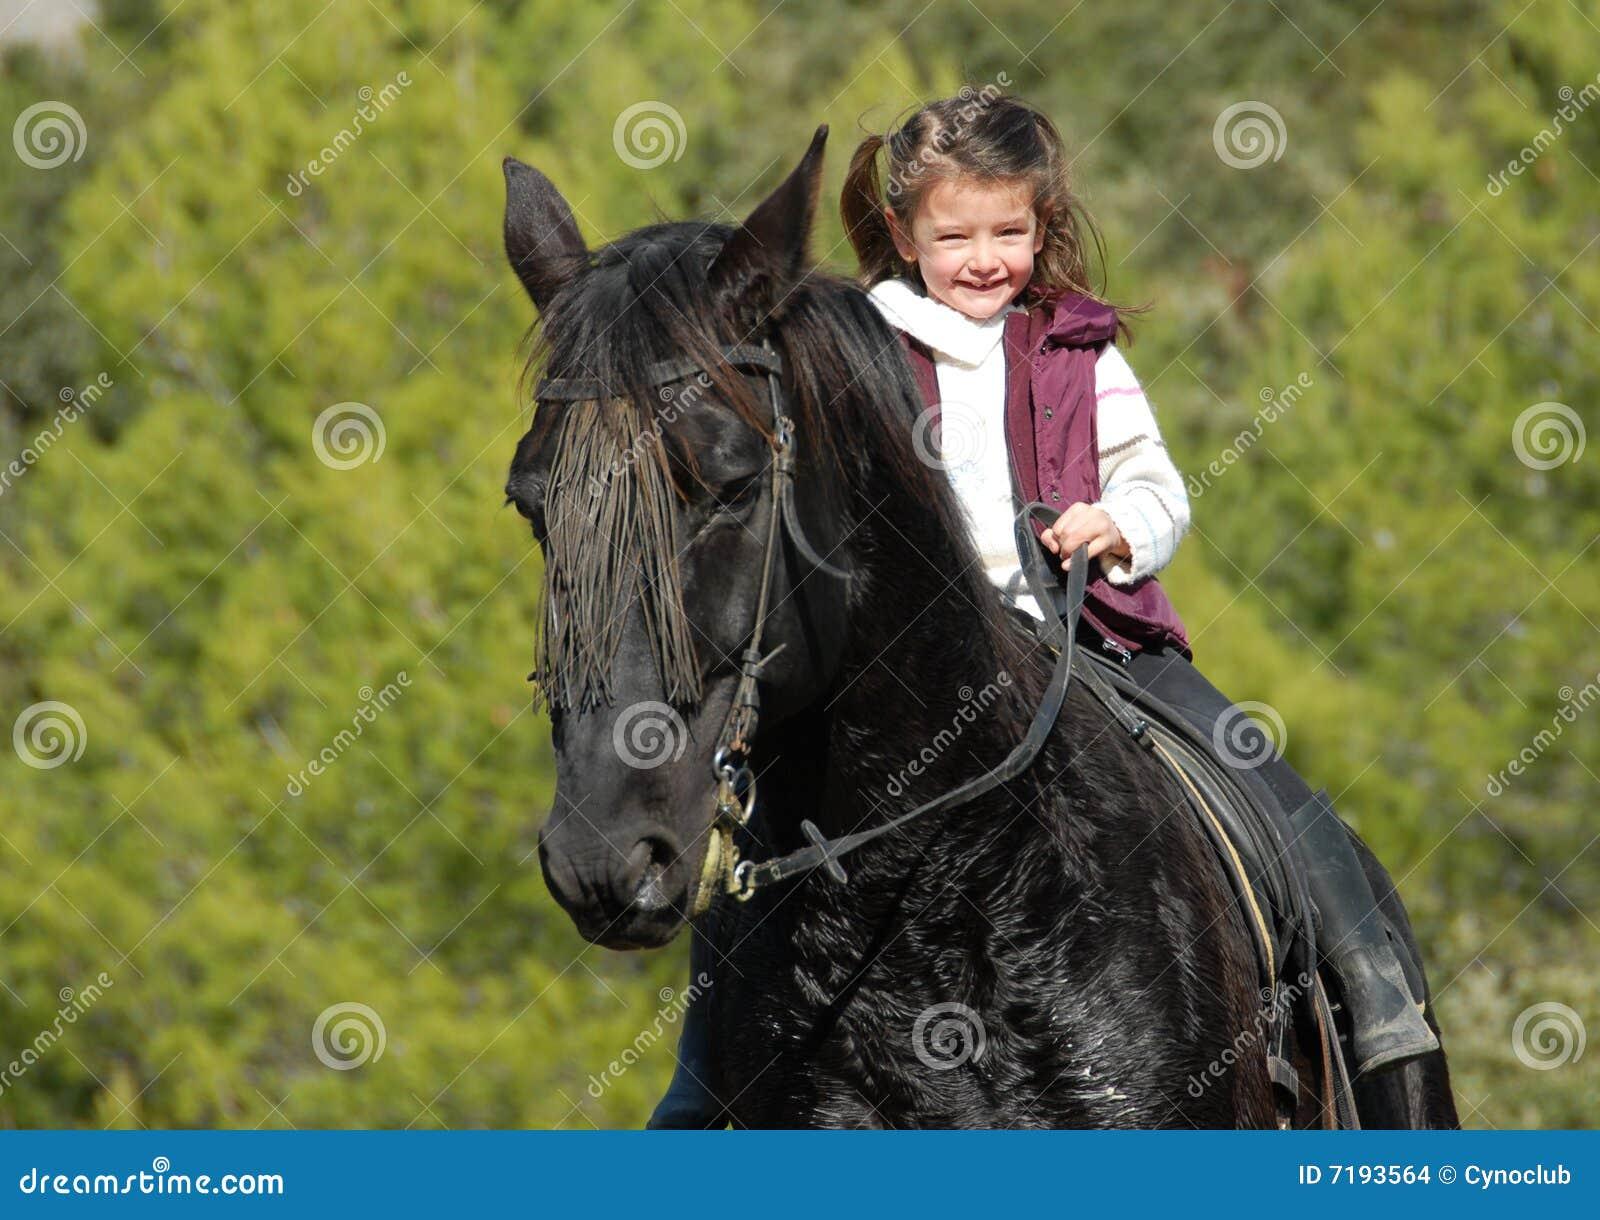 photo cheval et petite fille